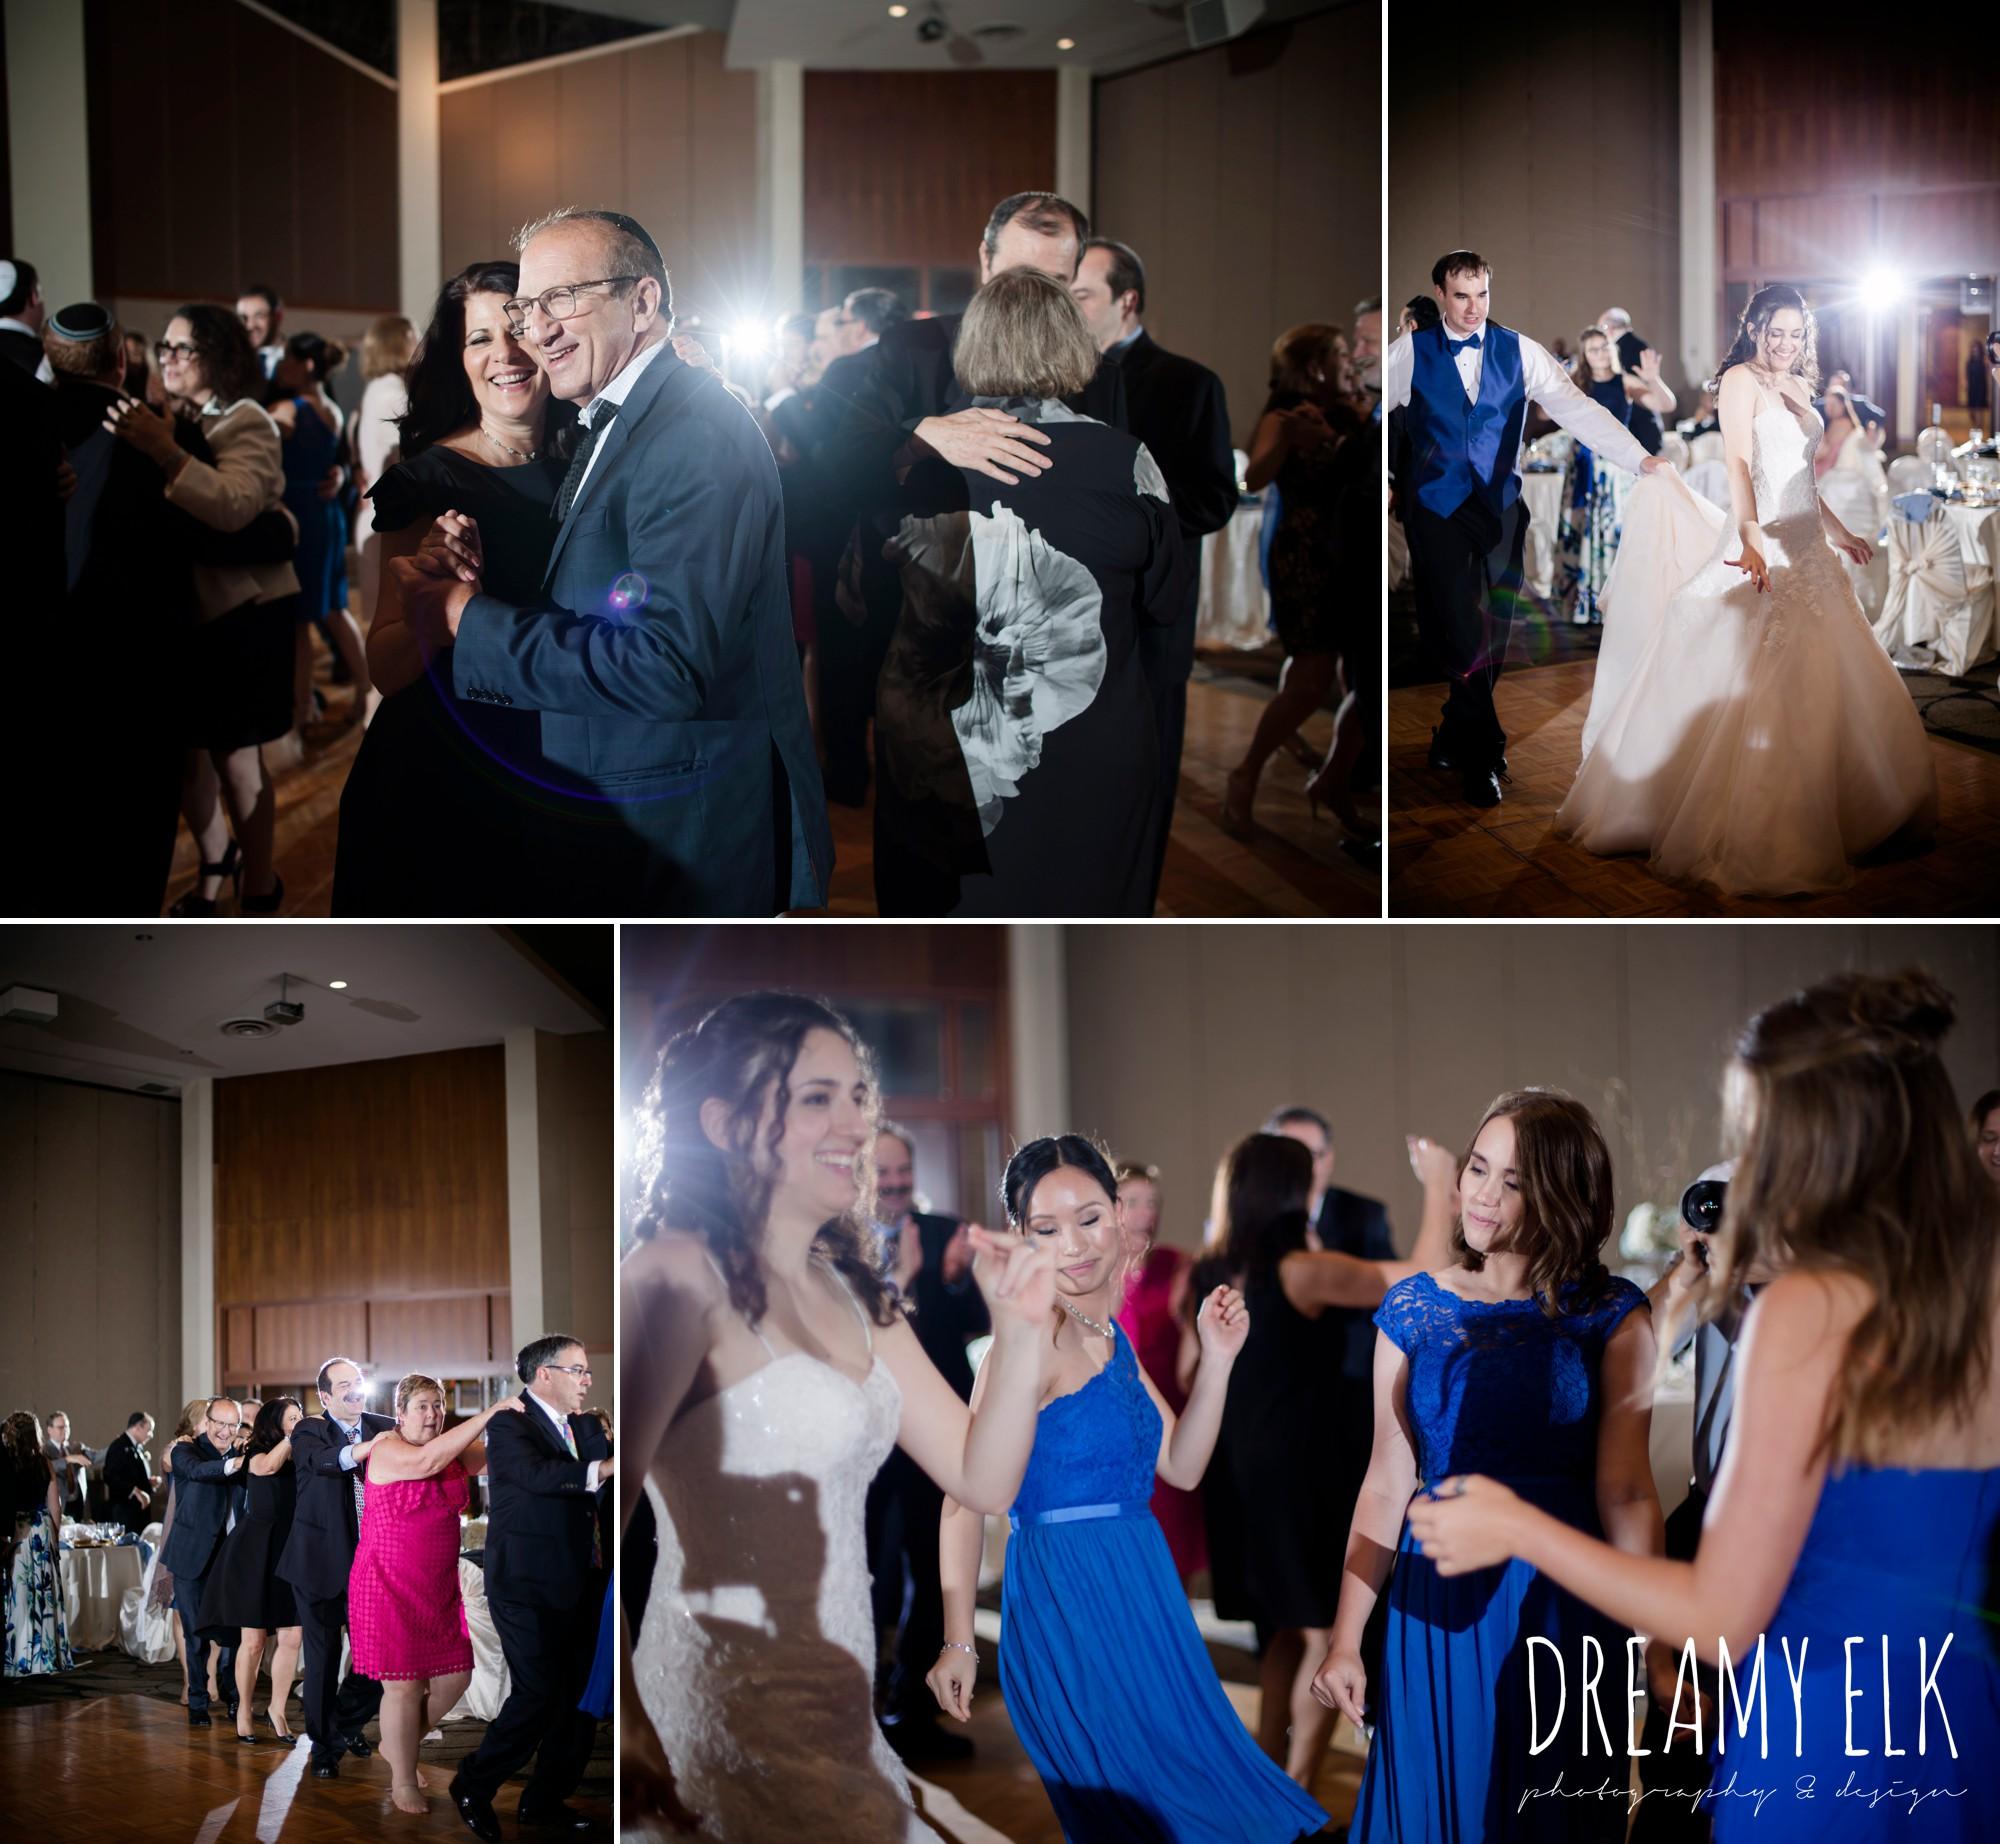 guests dancing at wedding reception, summer june jewish wedding photo {dreamy elk photography and design}